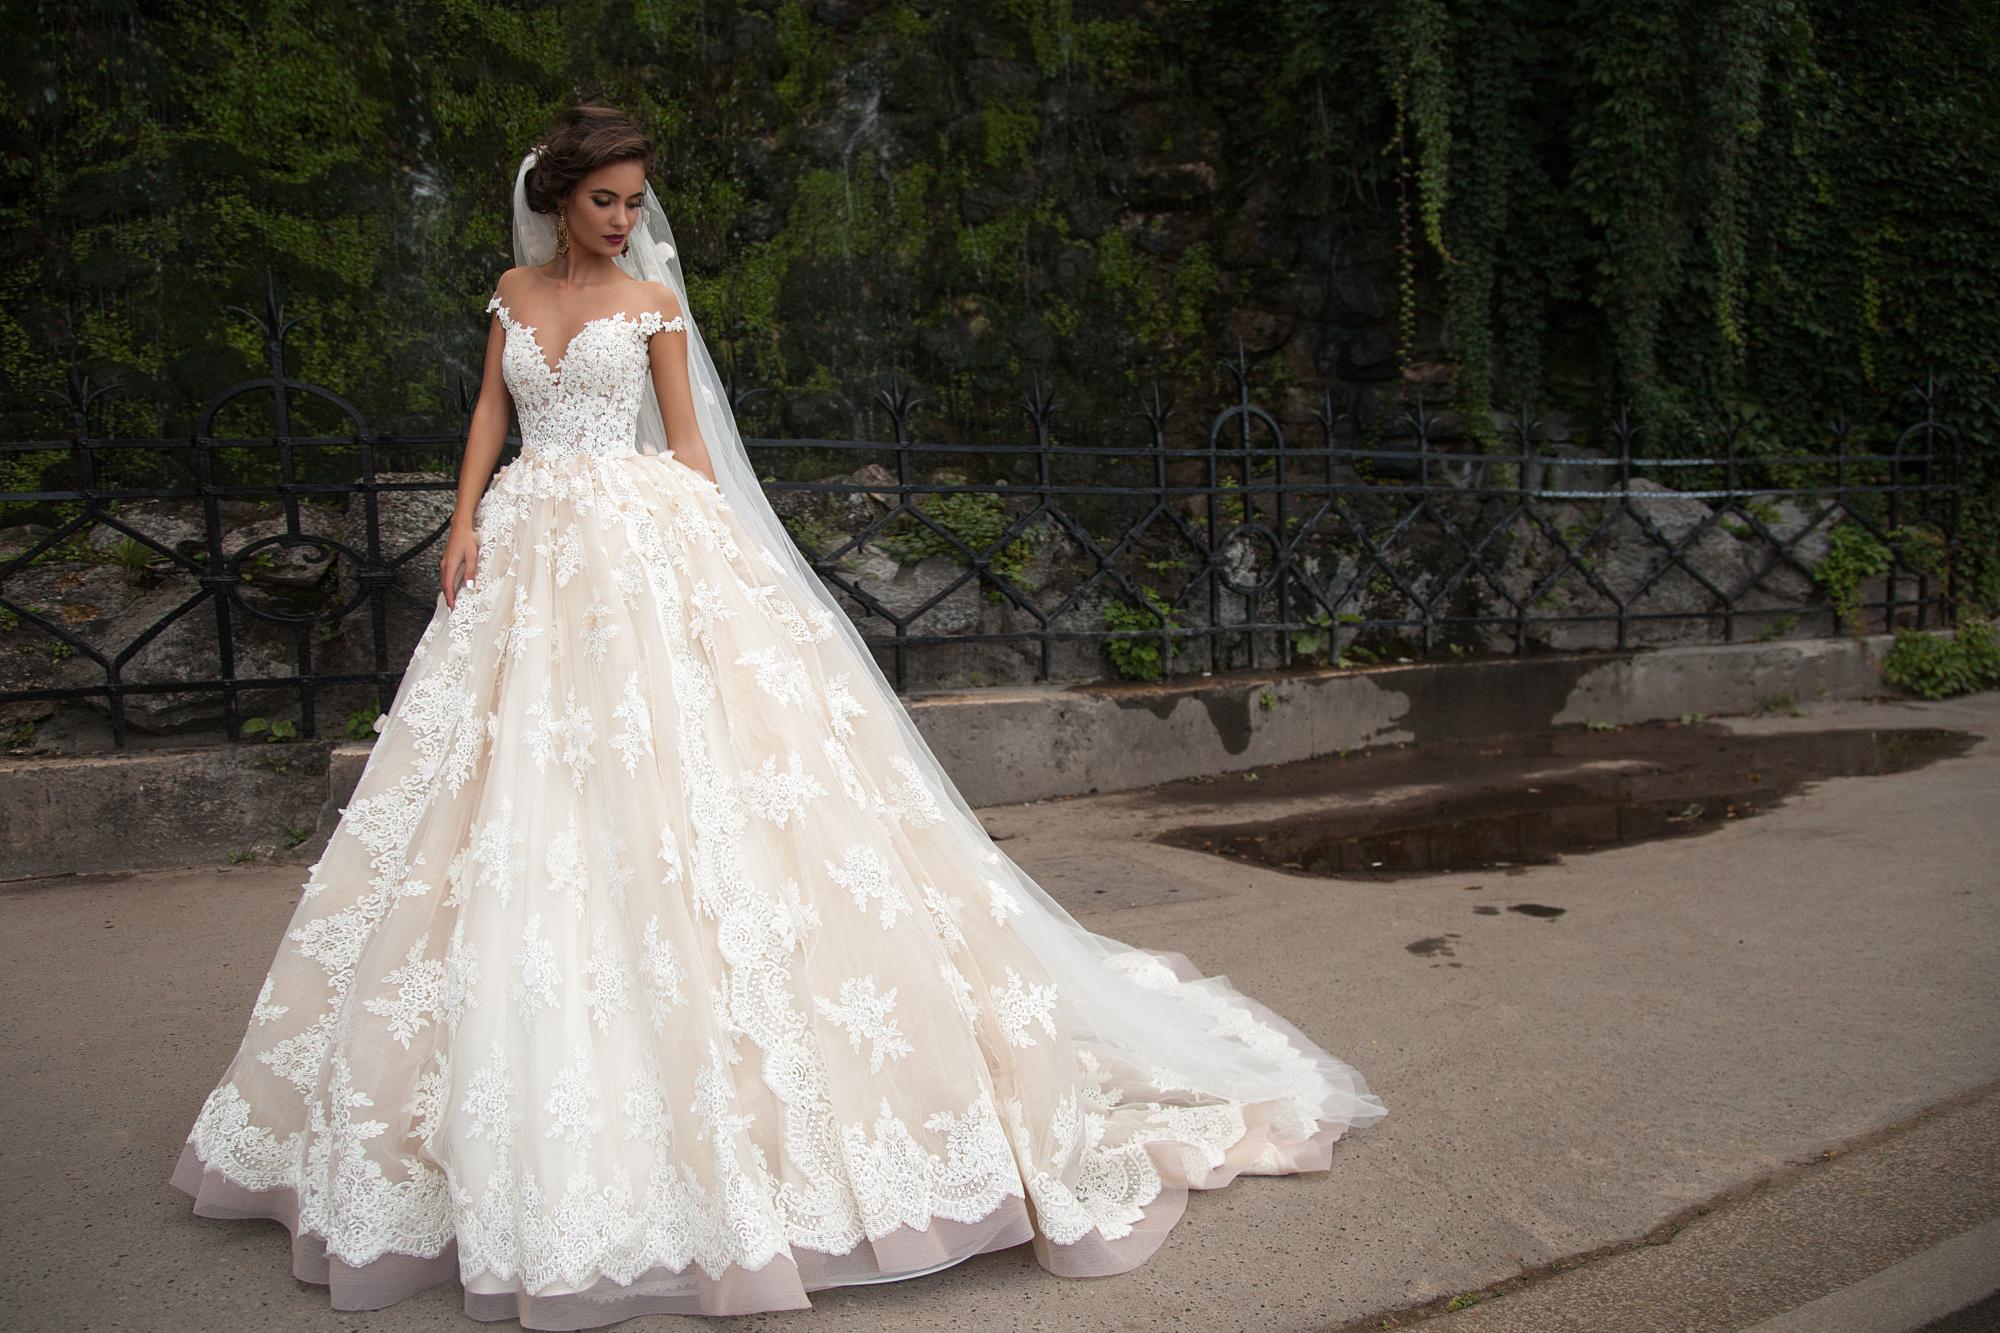 Milla Nova Wedding Dresses.Wedding Week Wedding Dresses 2 3 So Sue Me